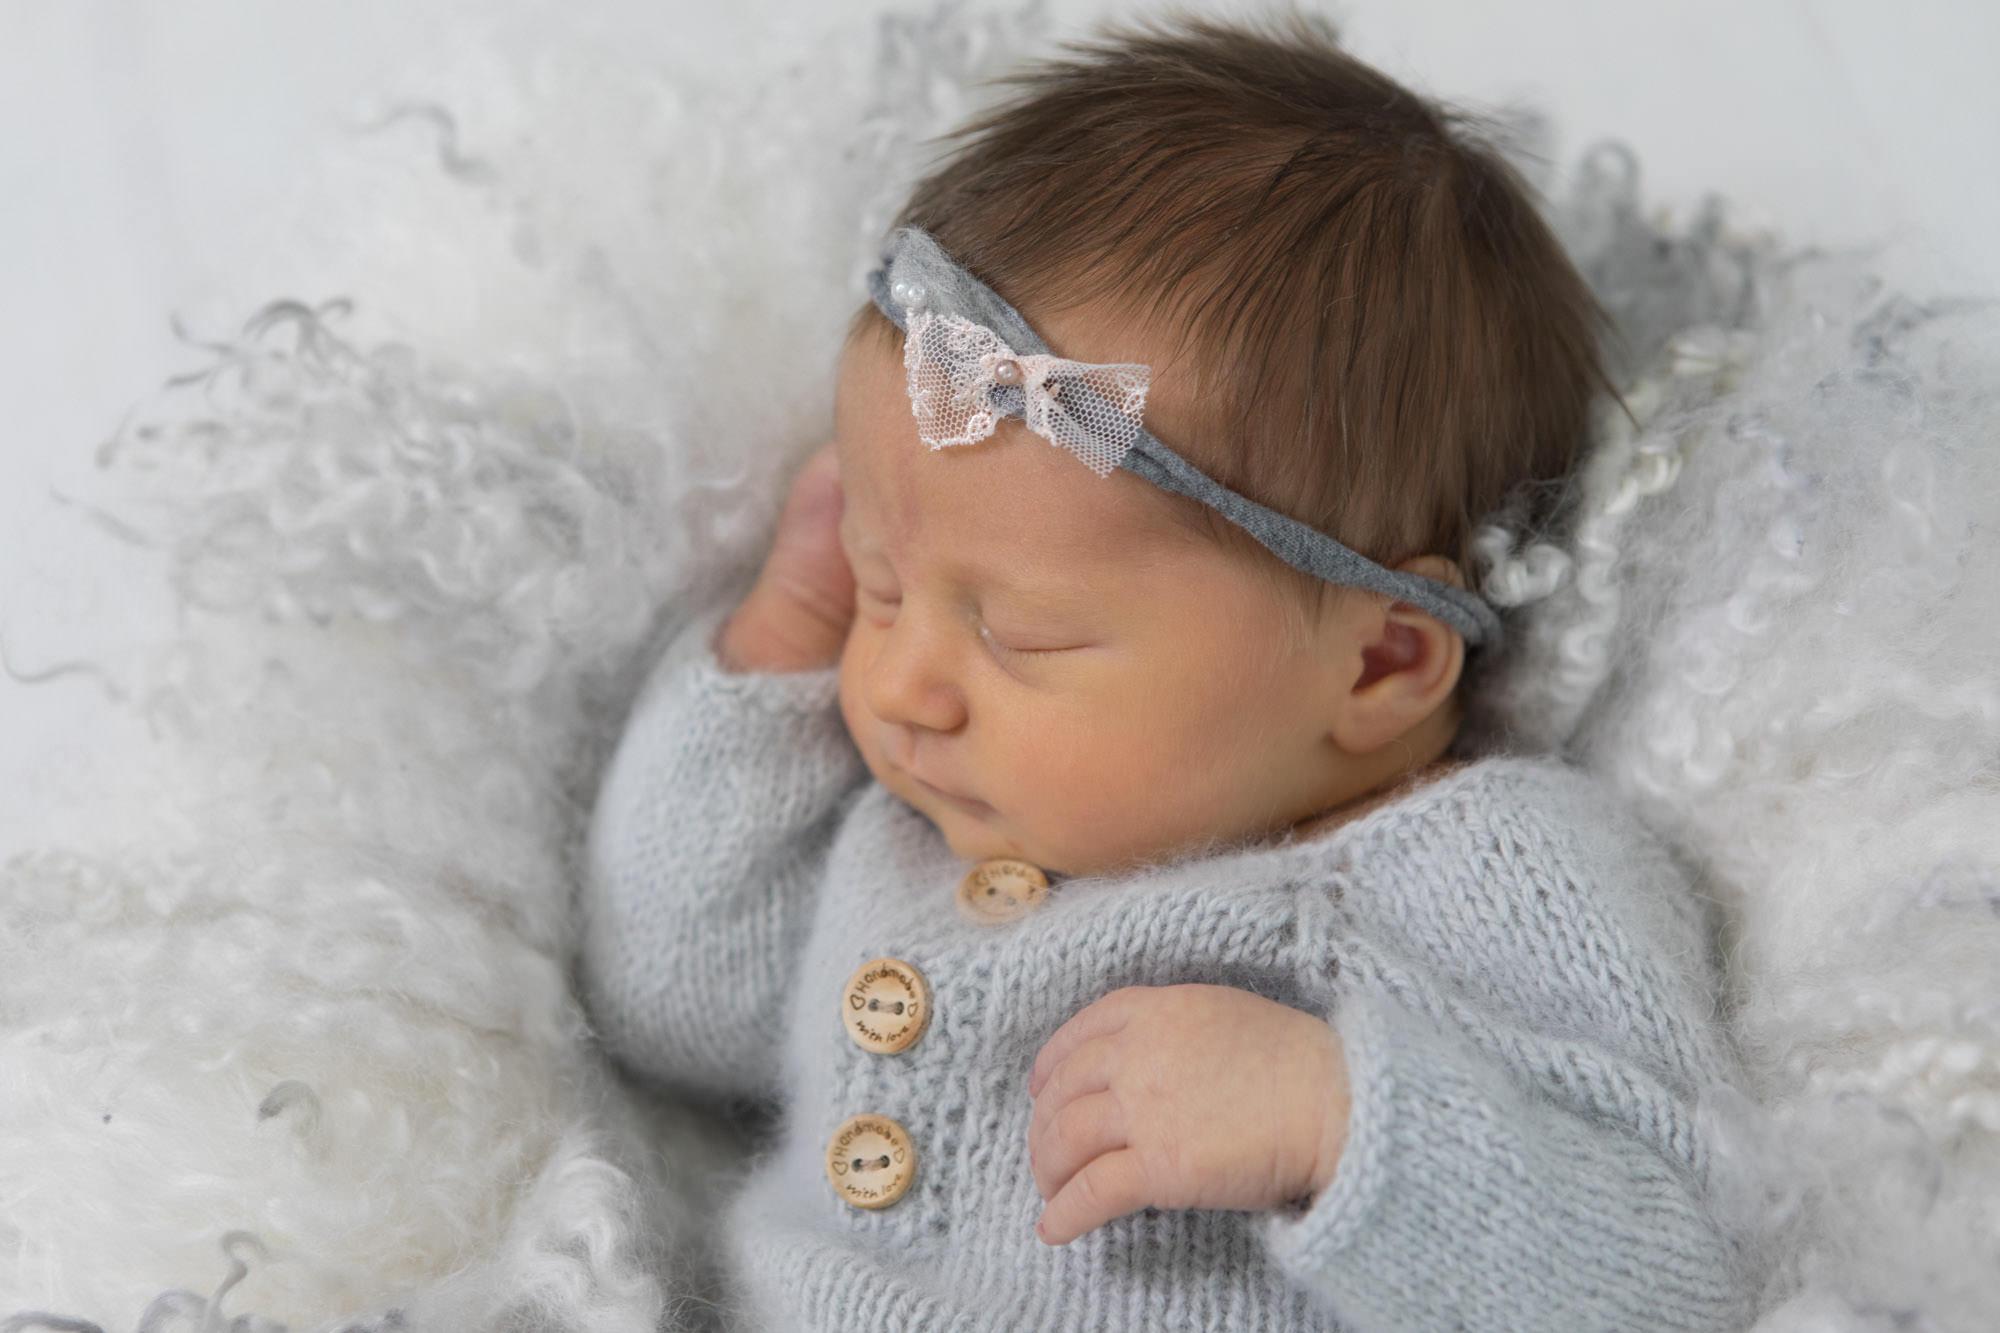 Neugeborenen Shooting - Baby unbearbeitet - vor der Bildbearbeitung